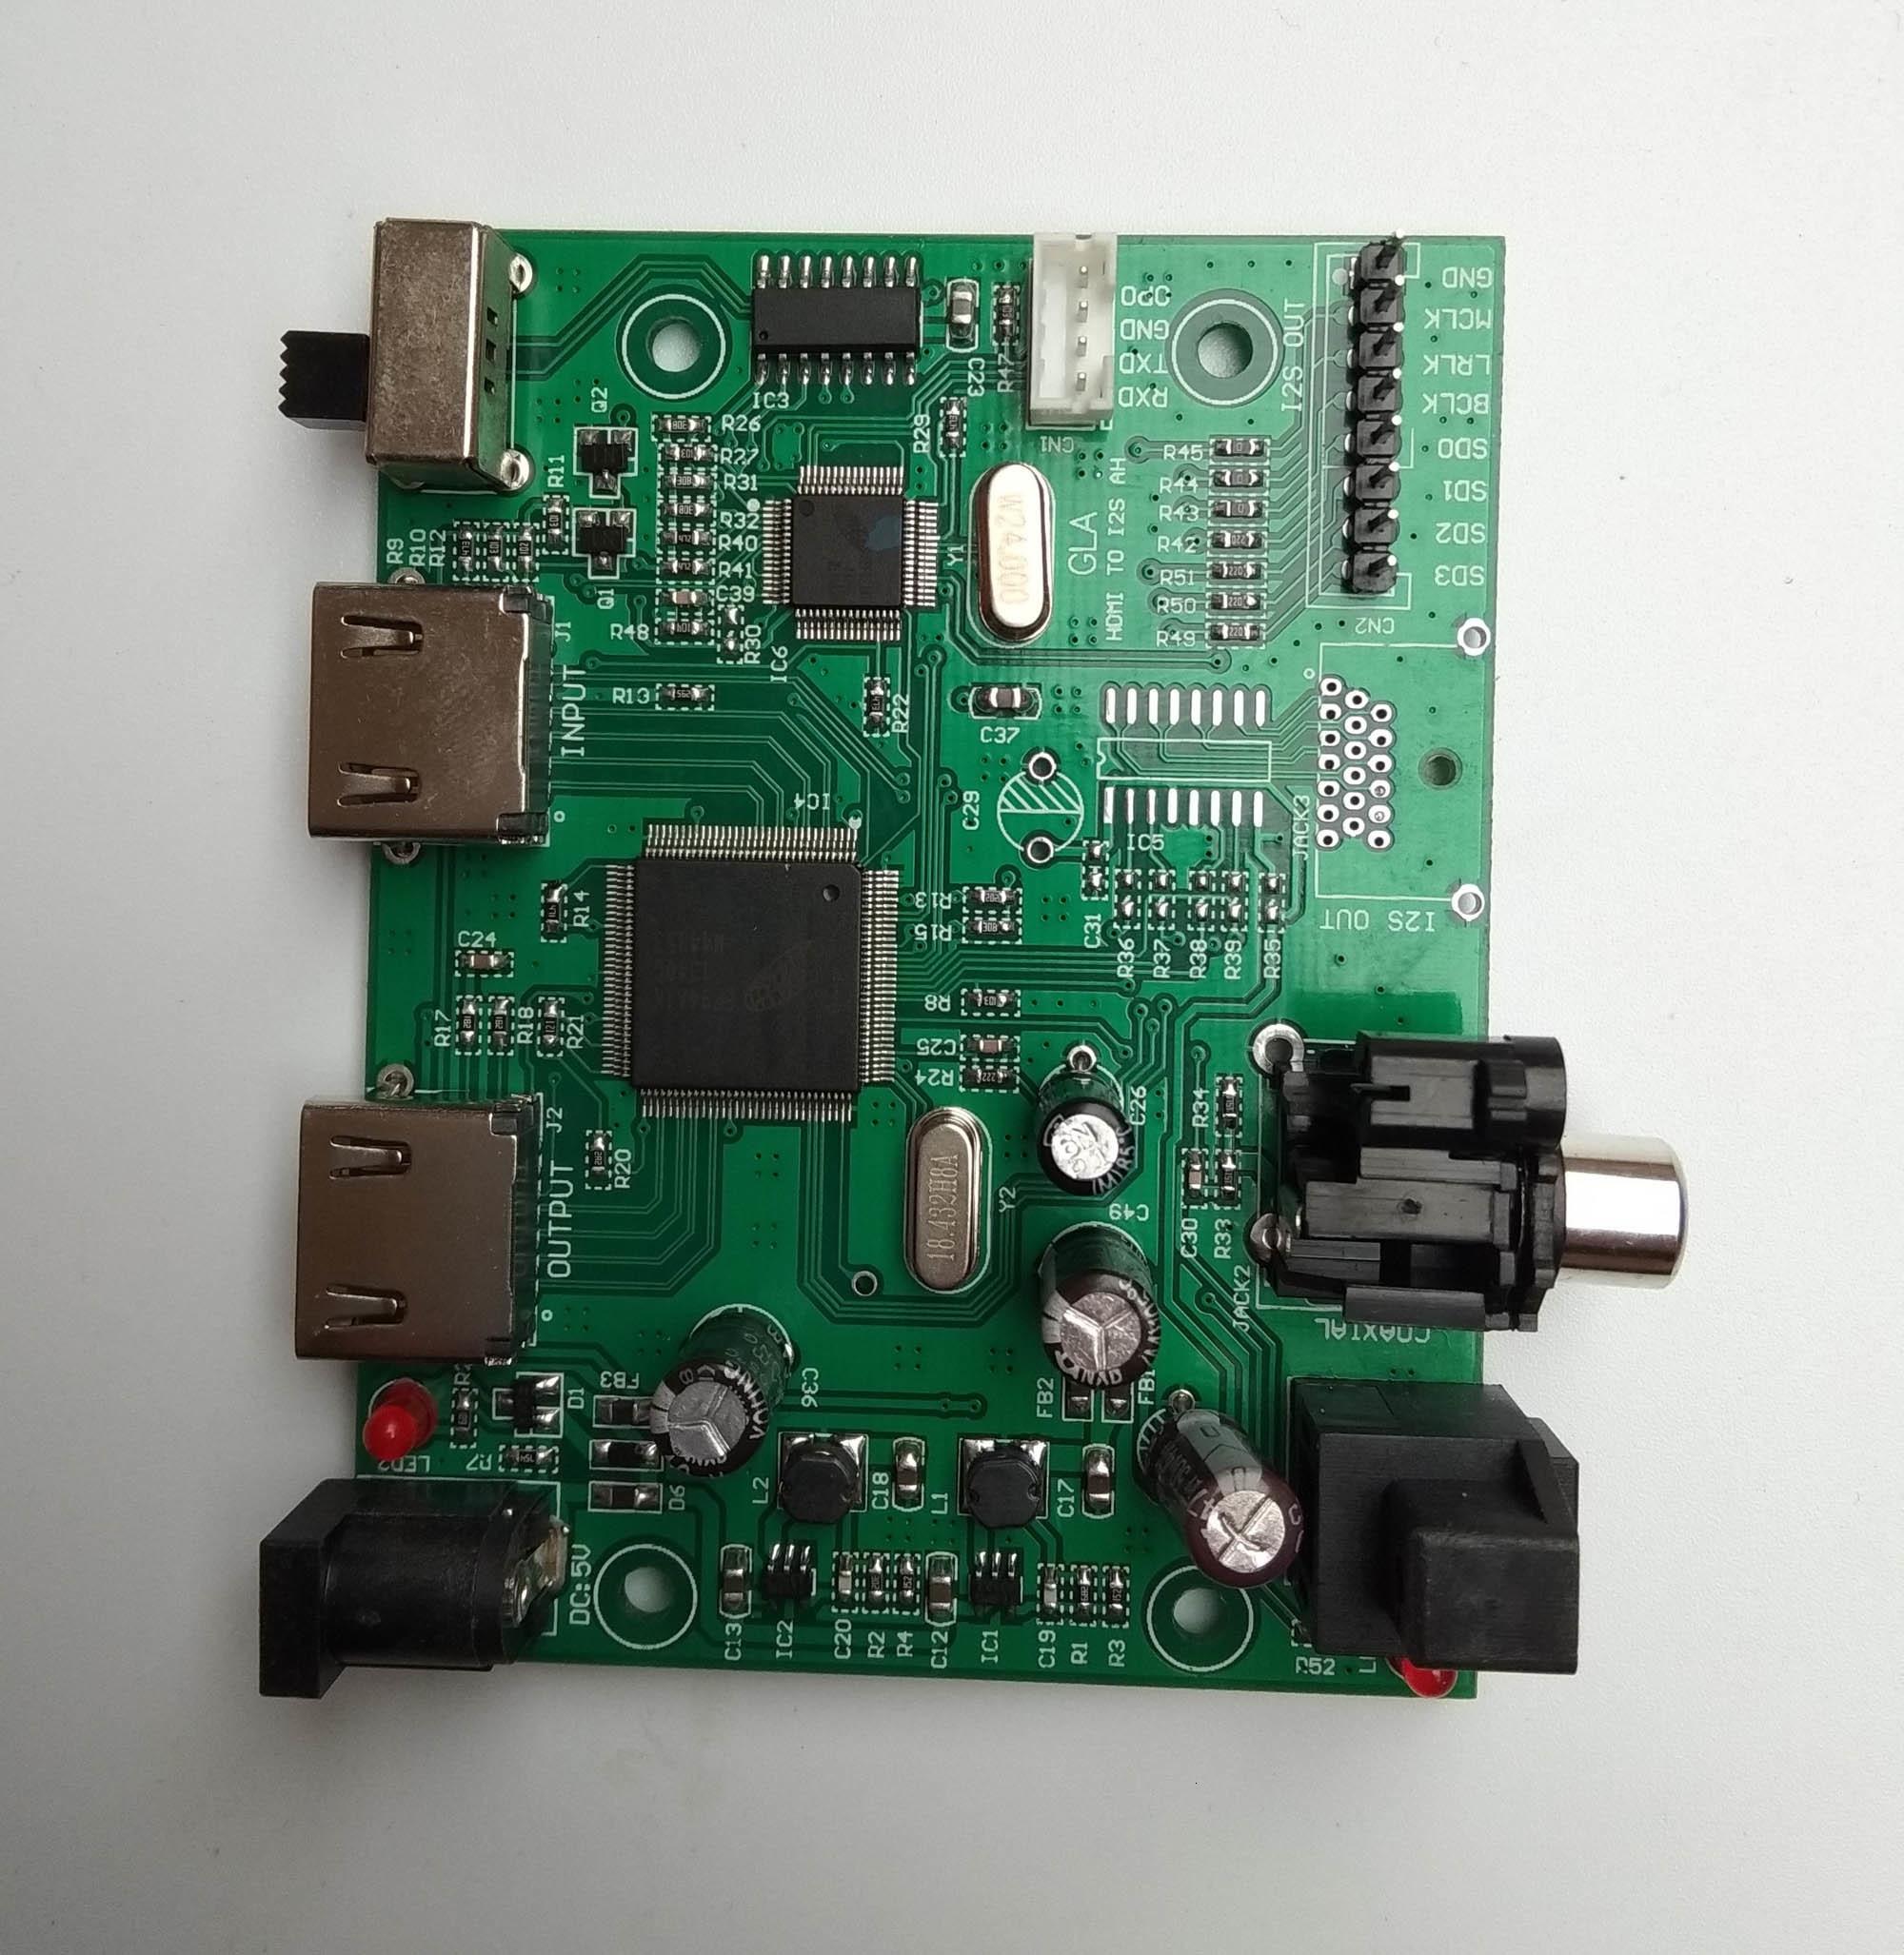 HDMI 分割エキスオーディオ 7.1 チャンネル I2S/DSD/HBR/繊維/同軸 (HDMI に I2S/ IIS)